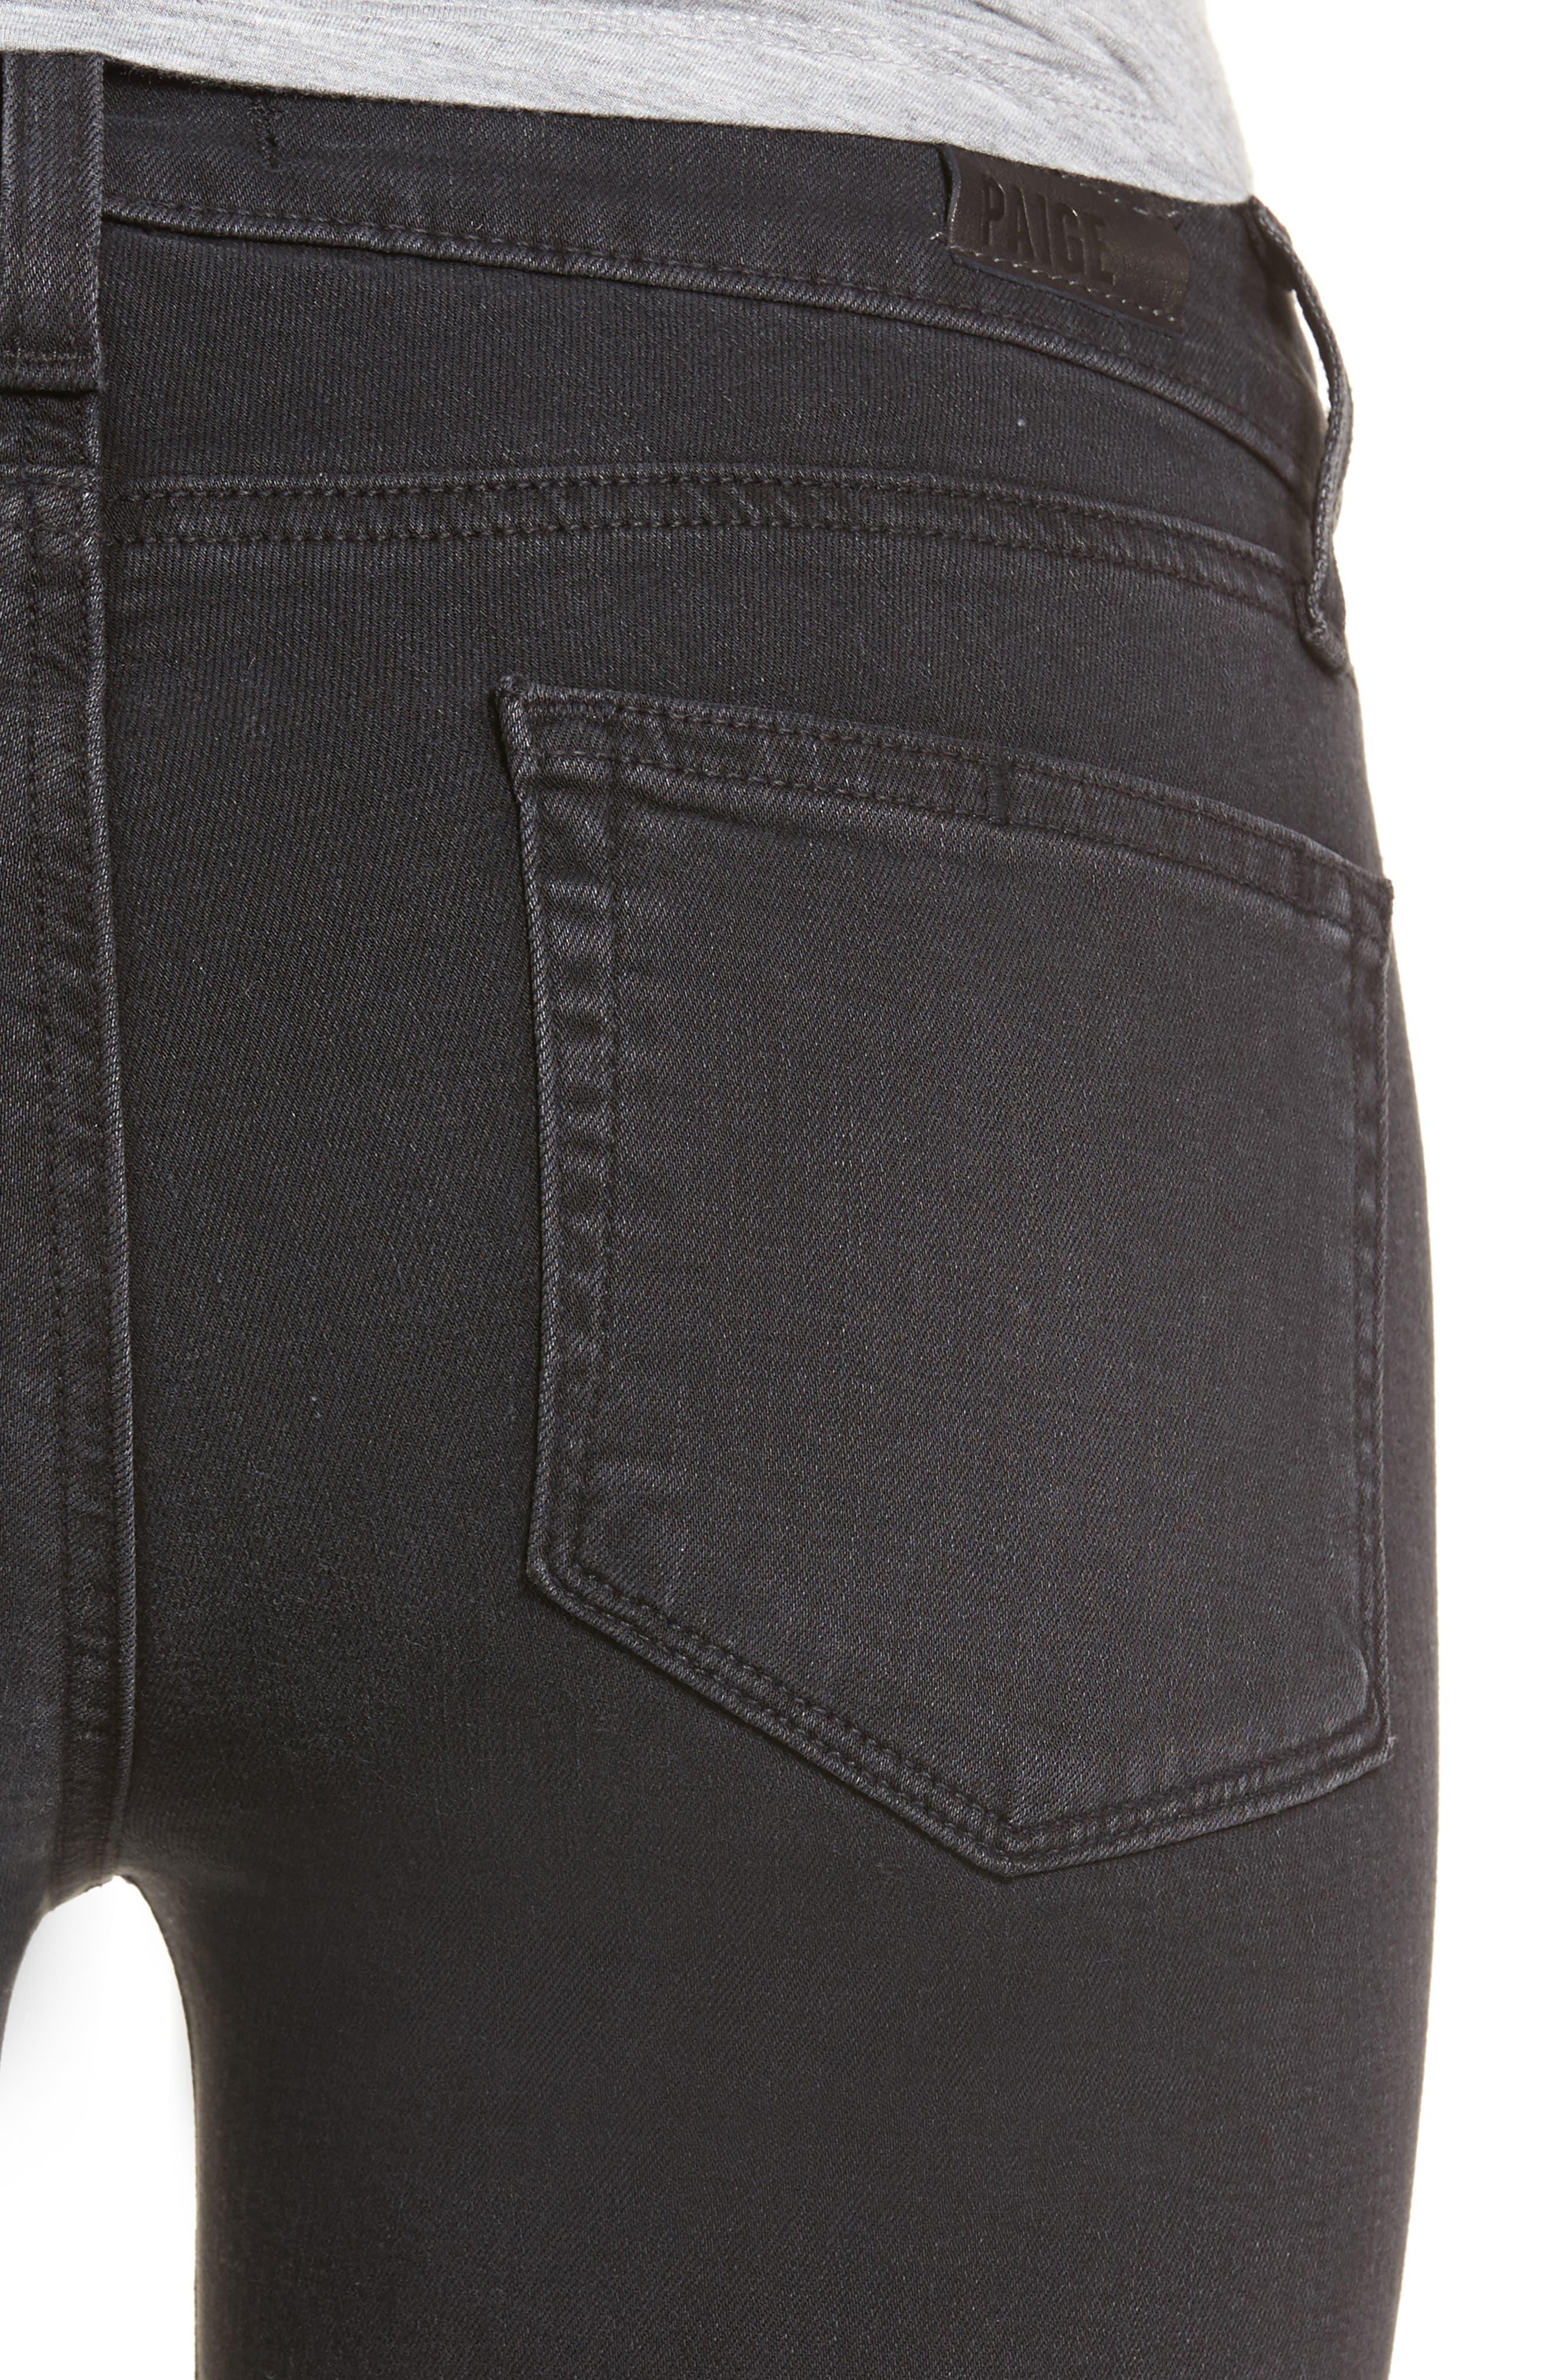 Transcend - Verdugo Ankle Skinny Jeans,                             Alternate thumbnail 4, color,                             Black Fog Super Distressed